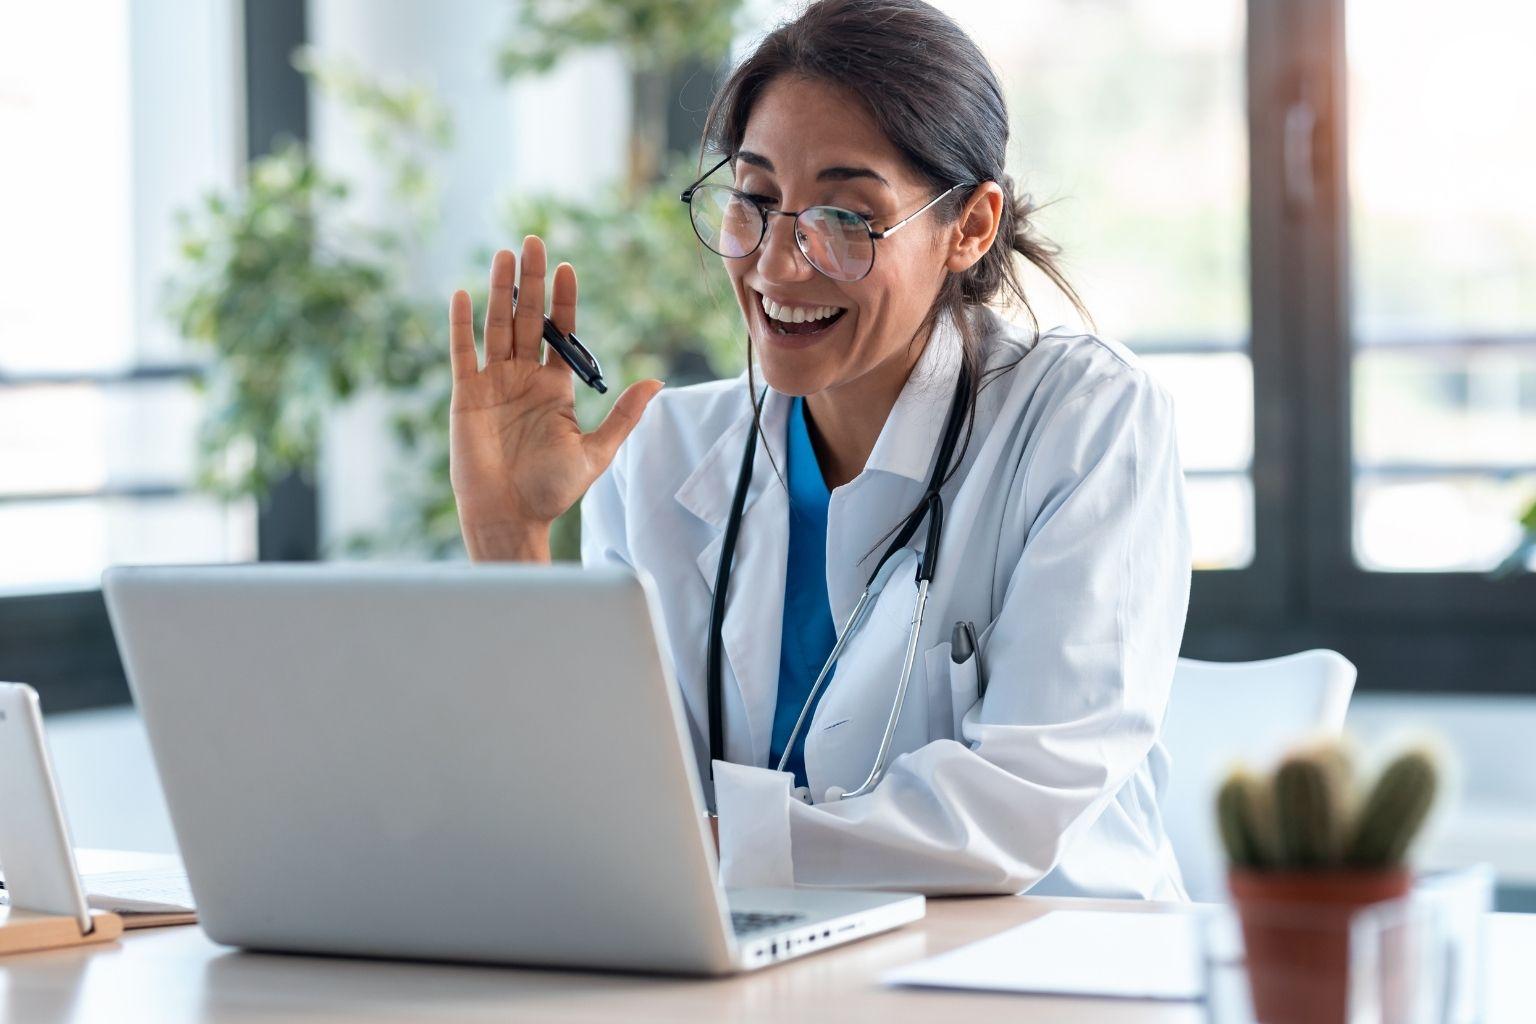 Doctor on telehealth call